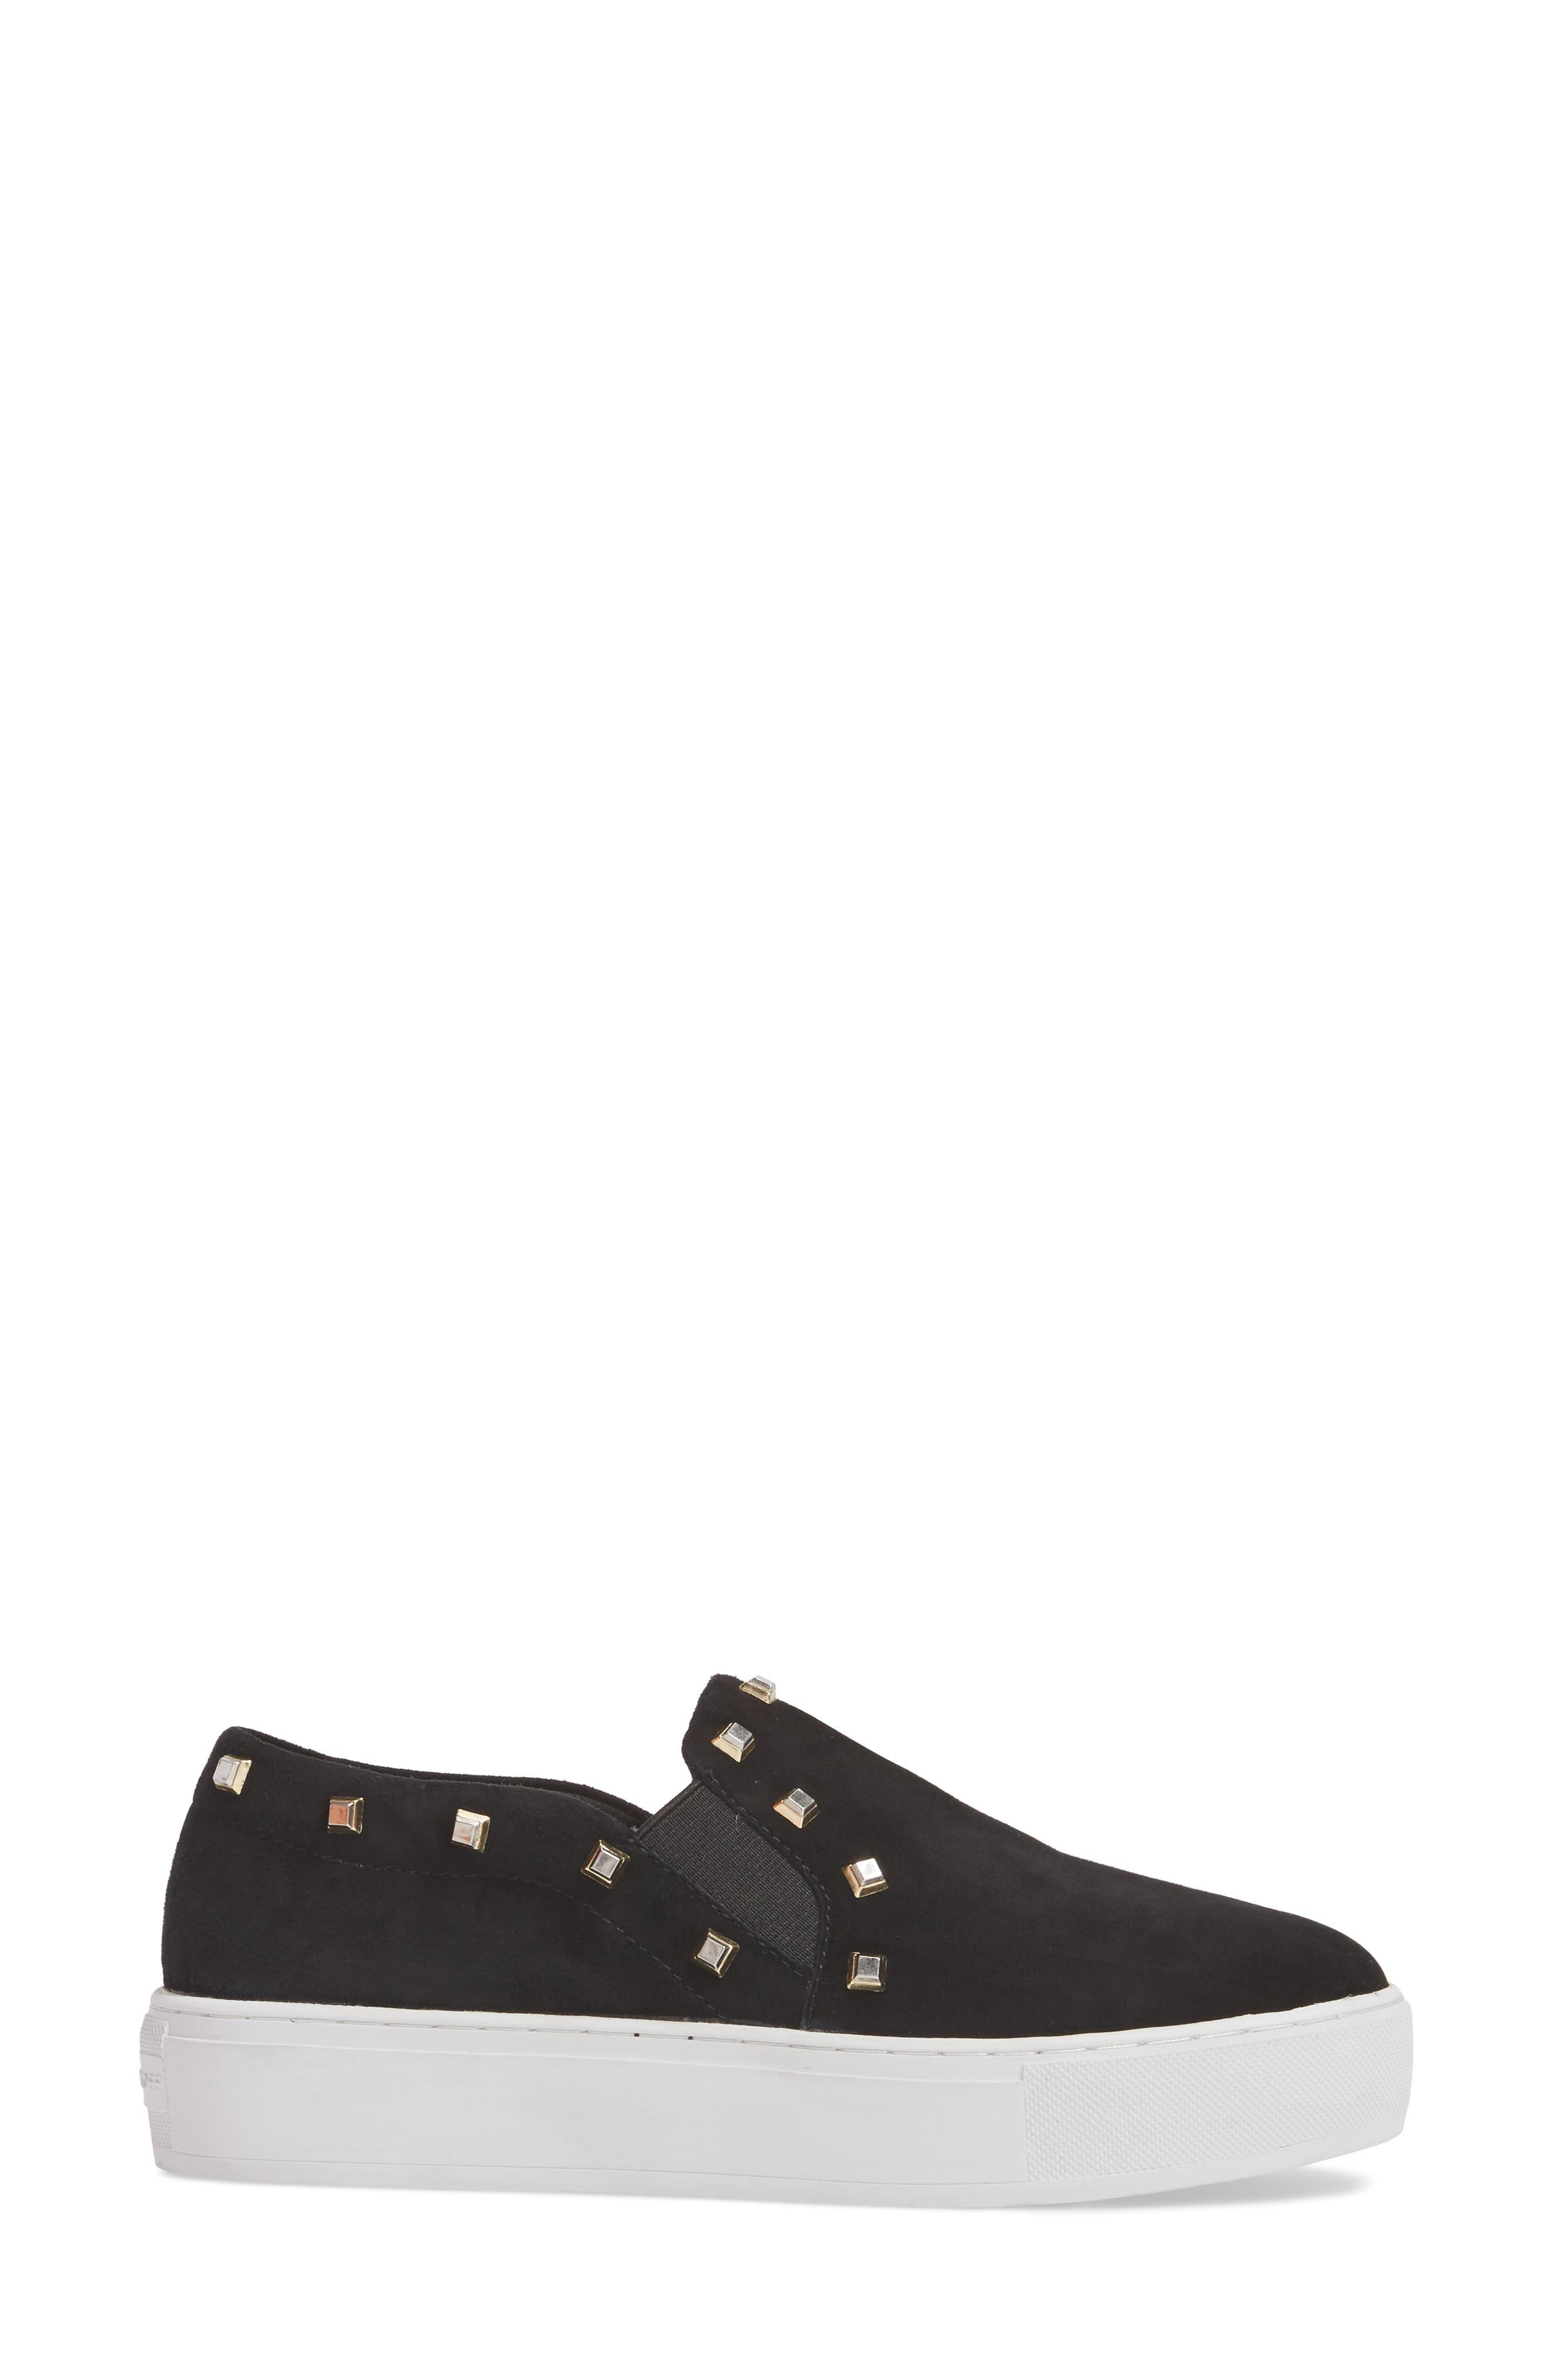 Nora Stud Platform Sneaker,                             Alternate thumbnail 3, color,                             Black Suede